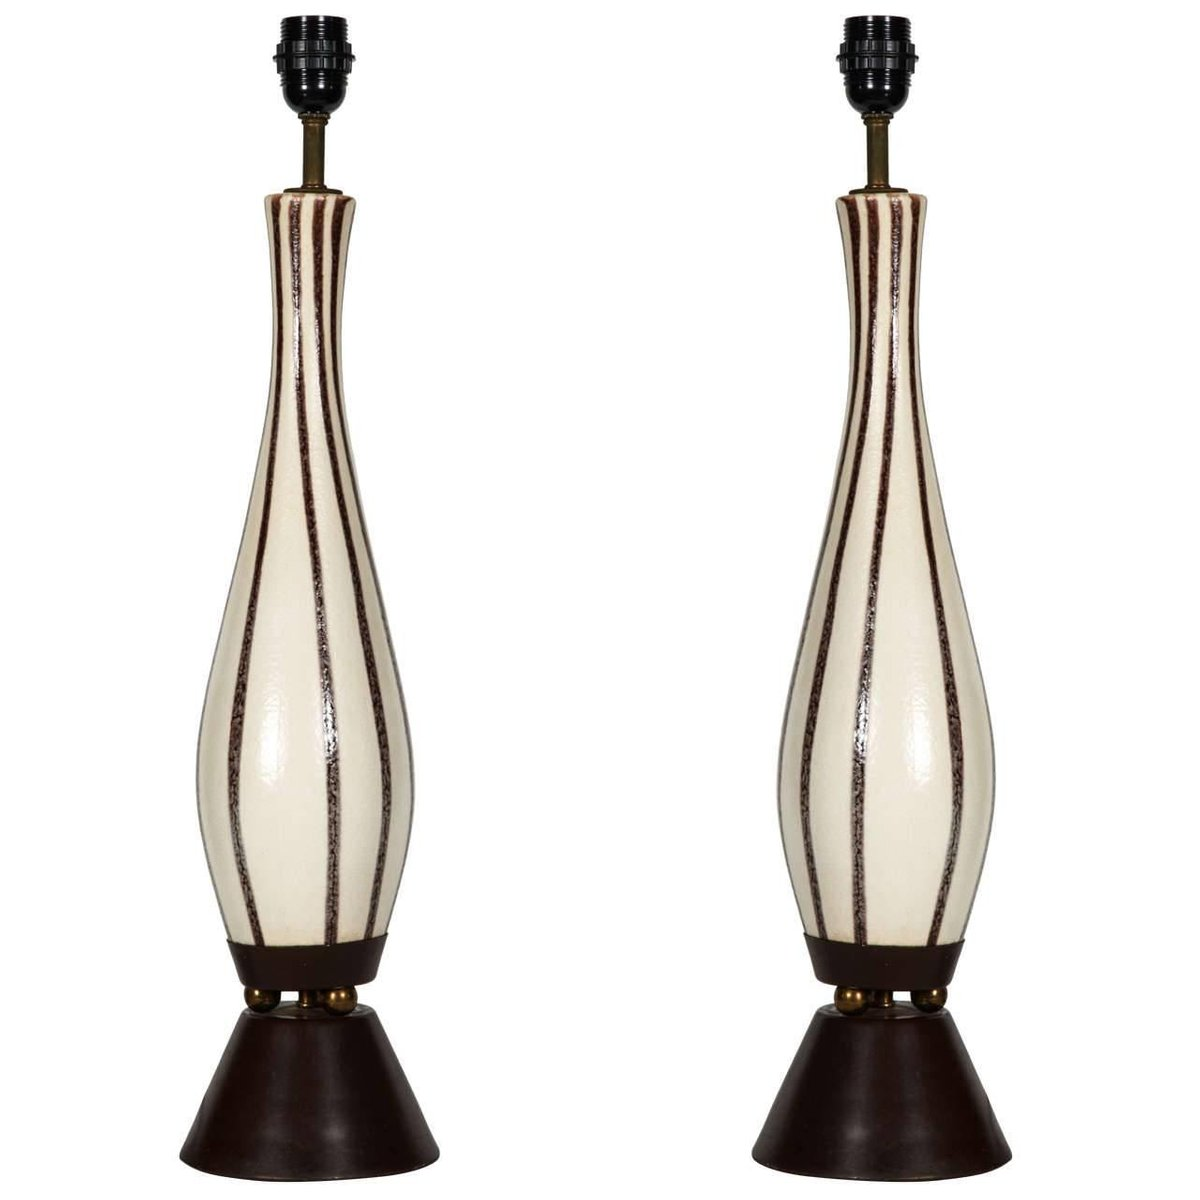 Keramik Tischlampen, 1960er, 2er Set